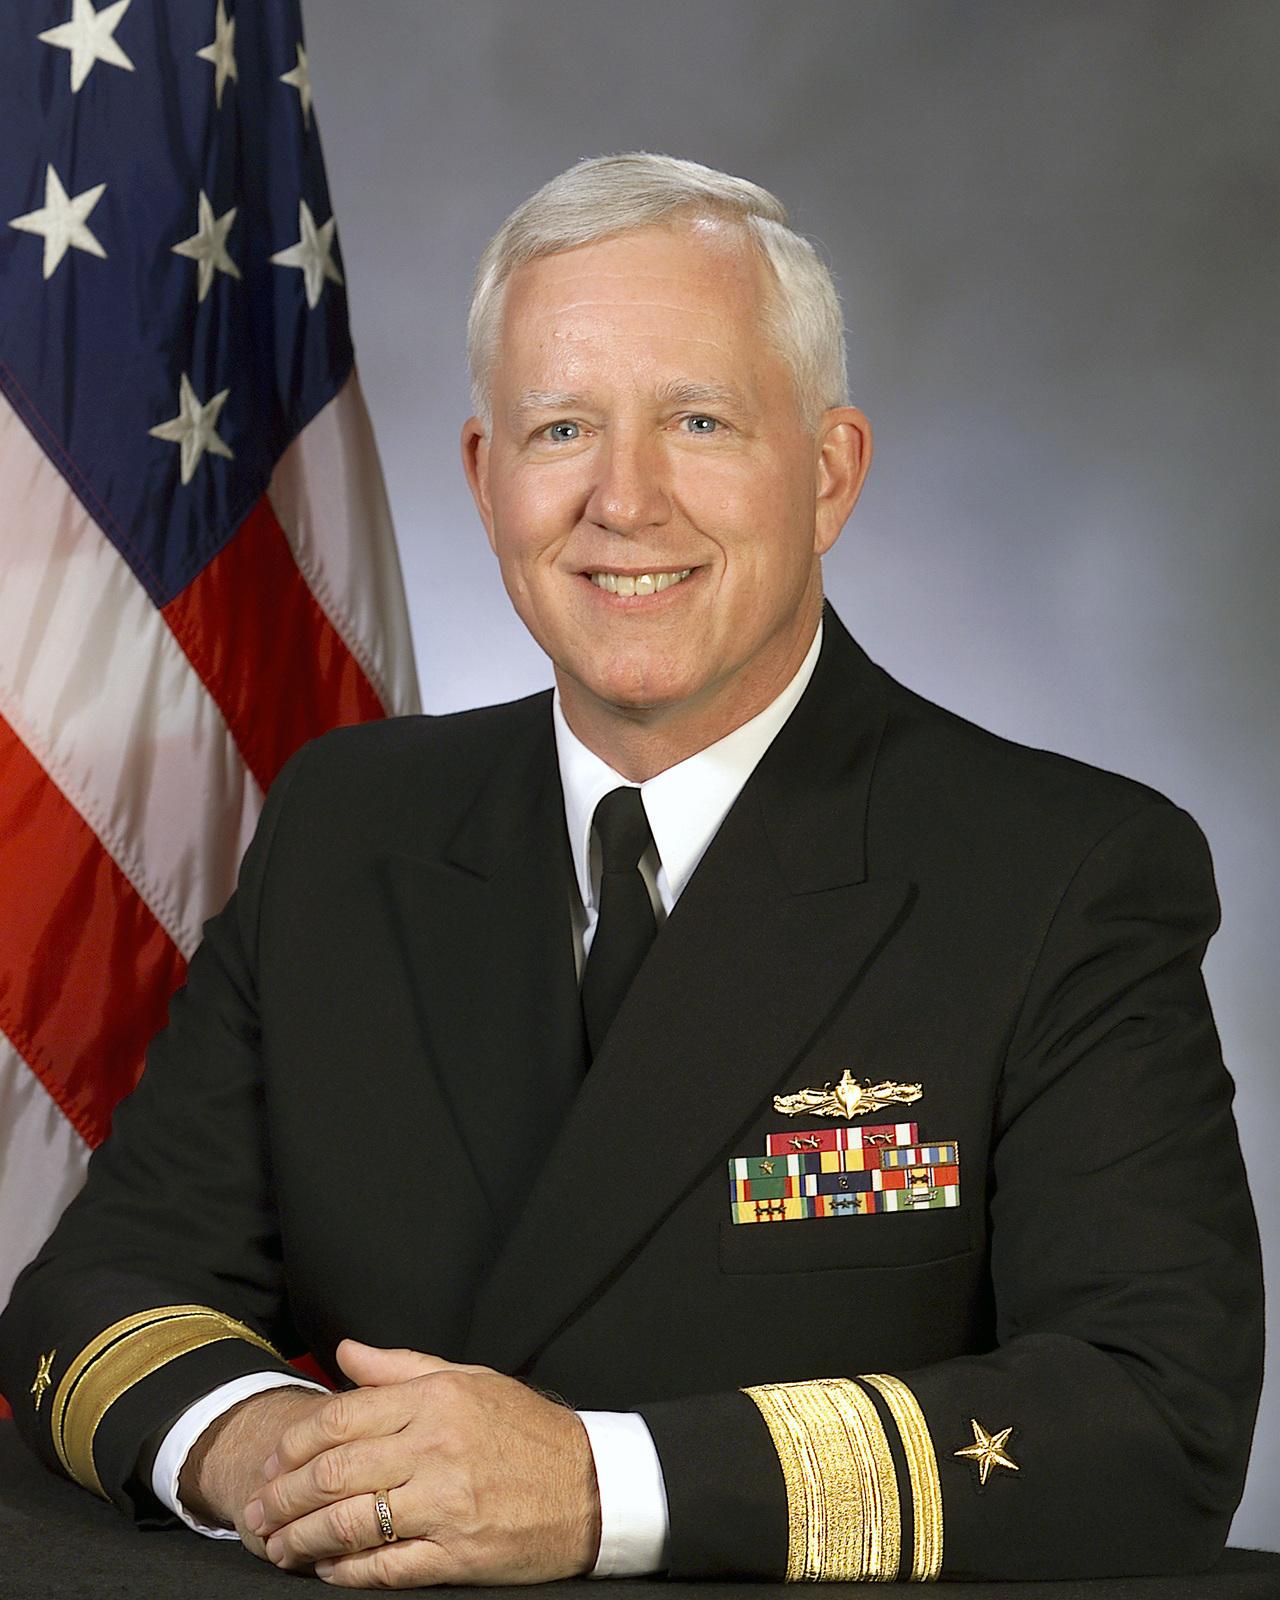 Portrait: Rear Admiral (RADM) (upper half) Michael G. Mathis, US Navy (USN) (uncovered)